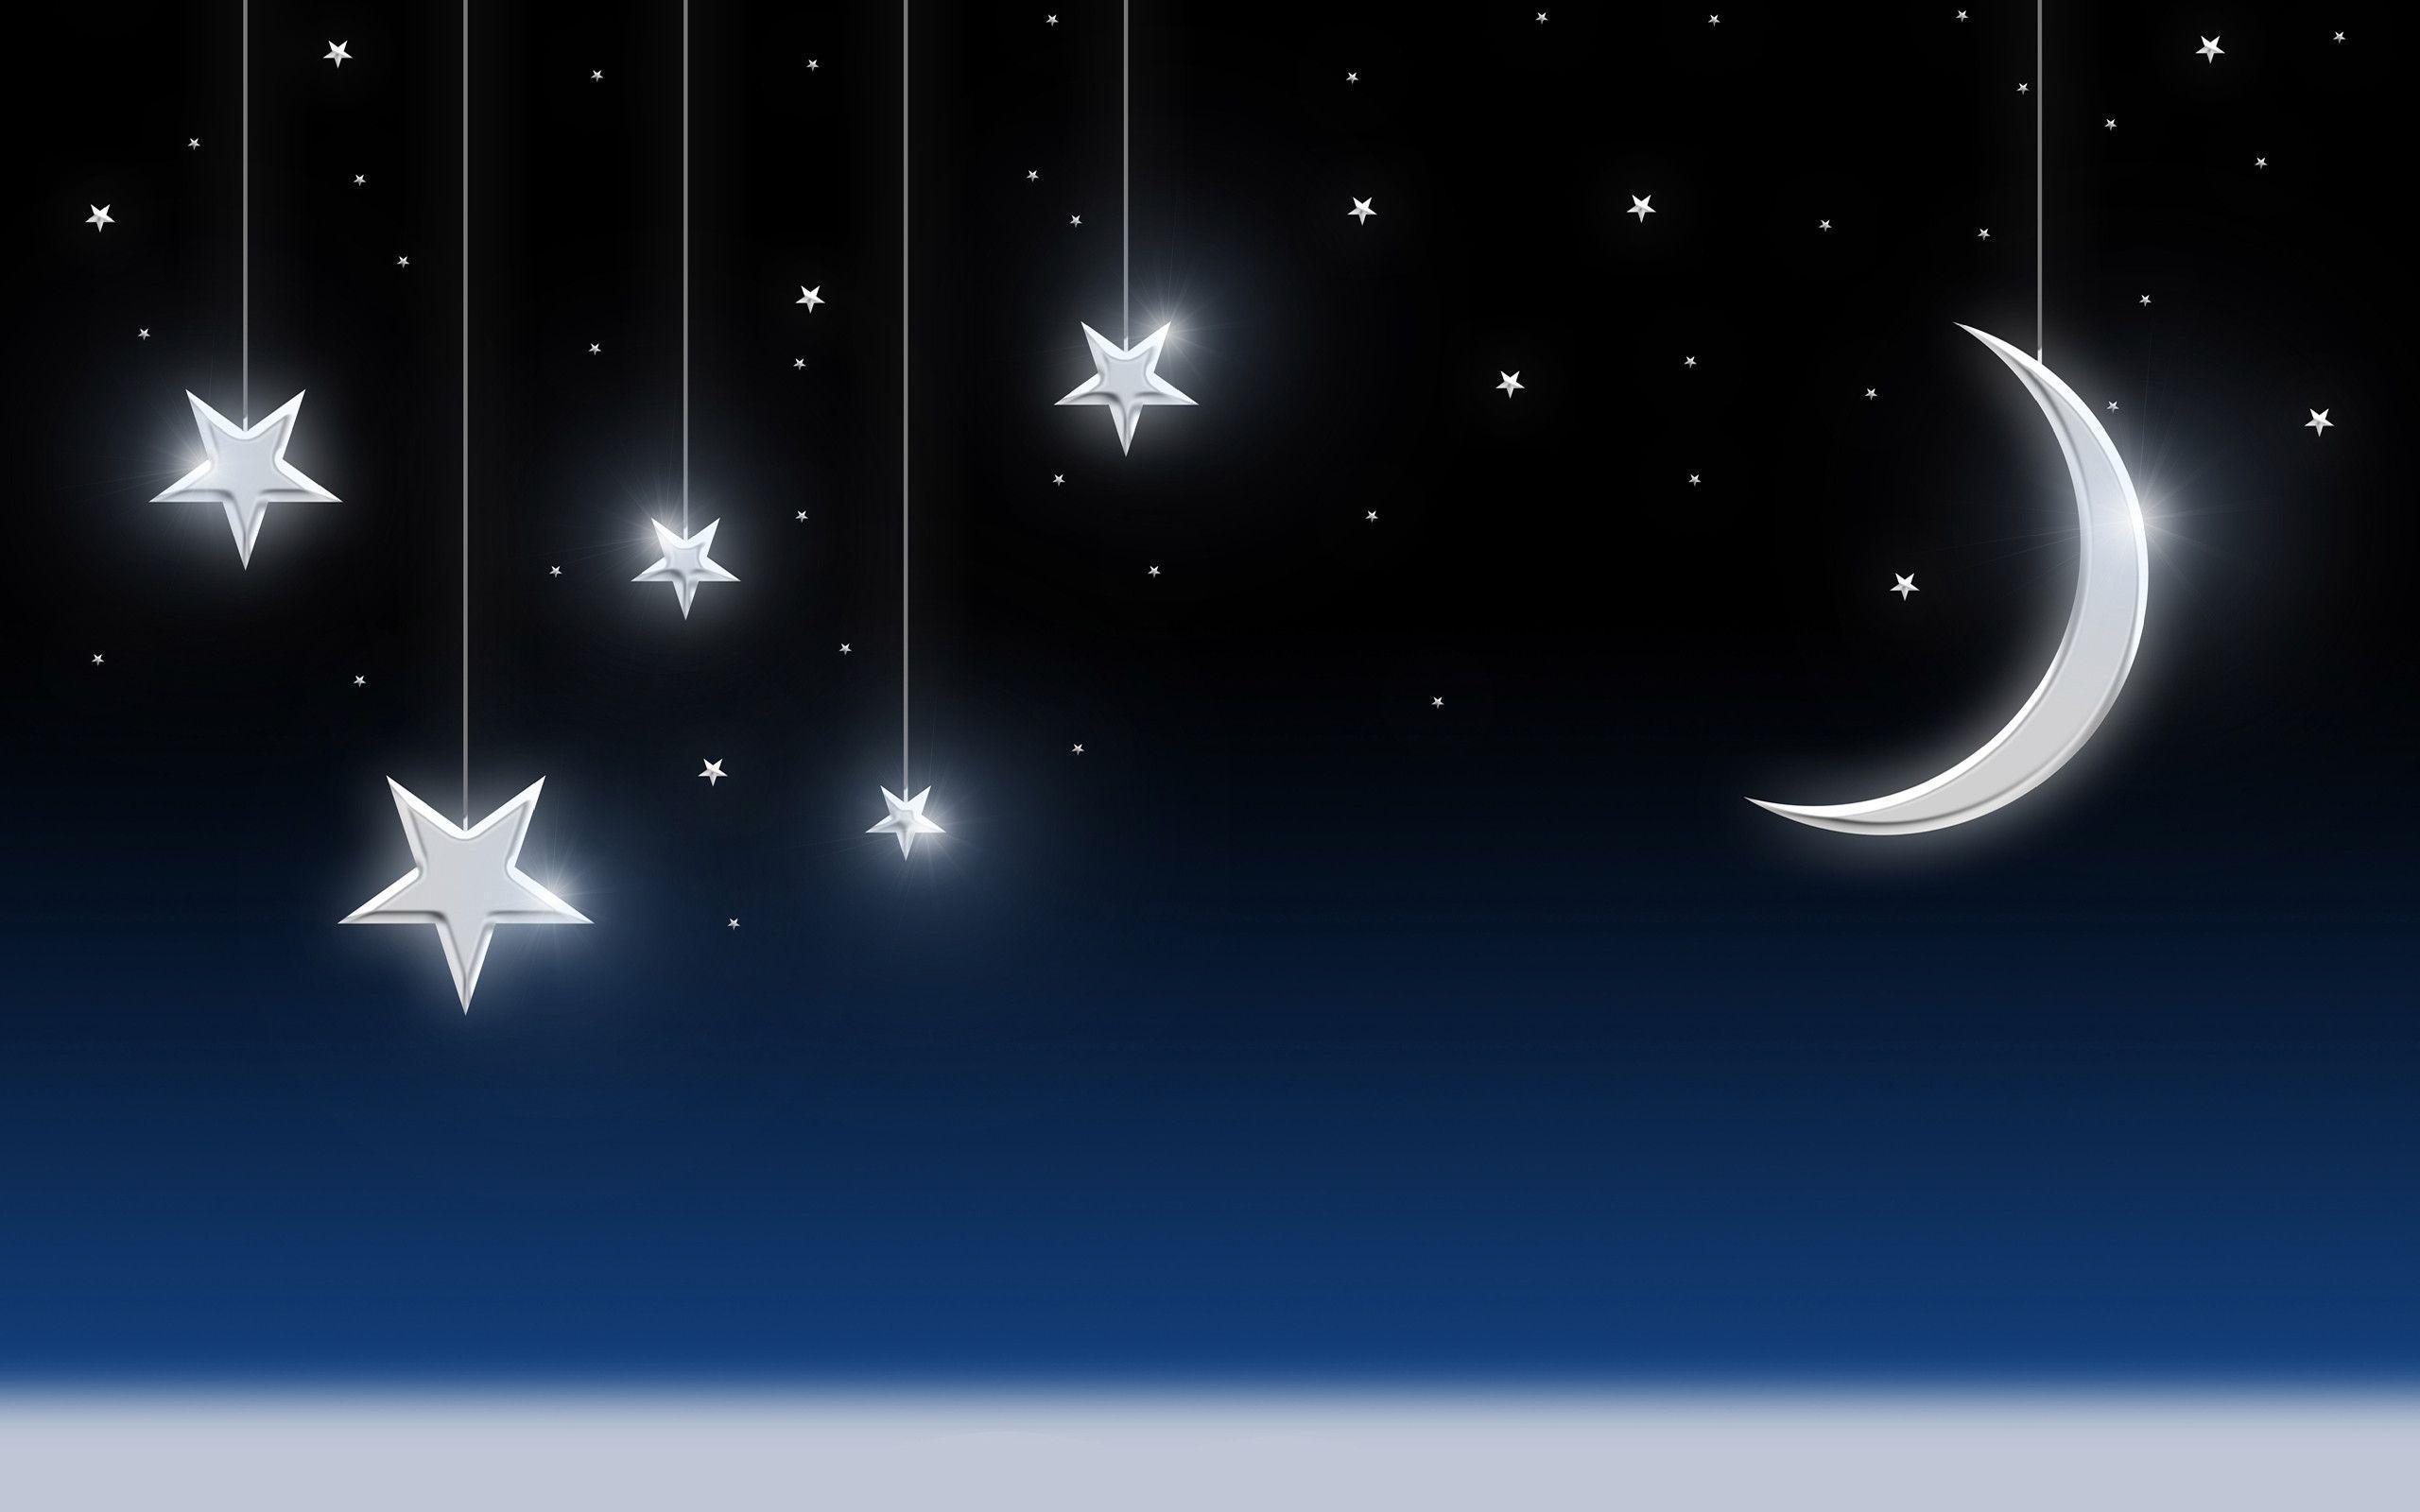 stars at night wallpaper - photo #27